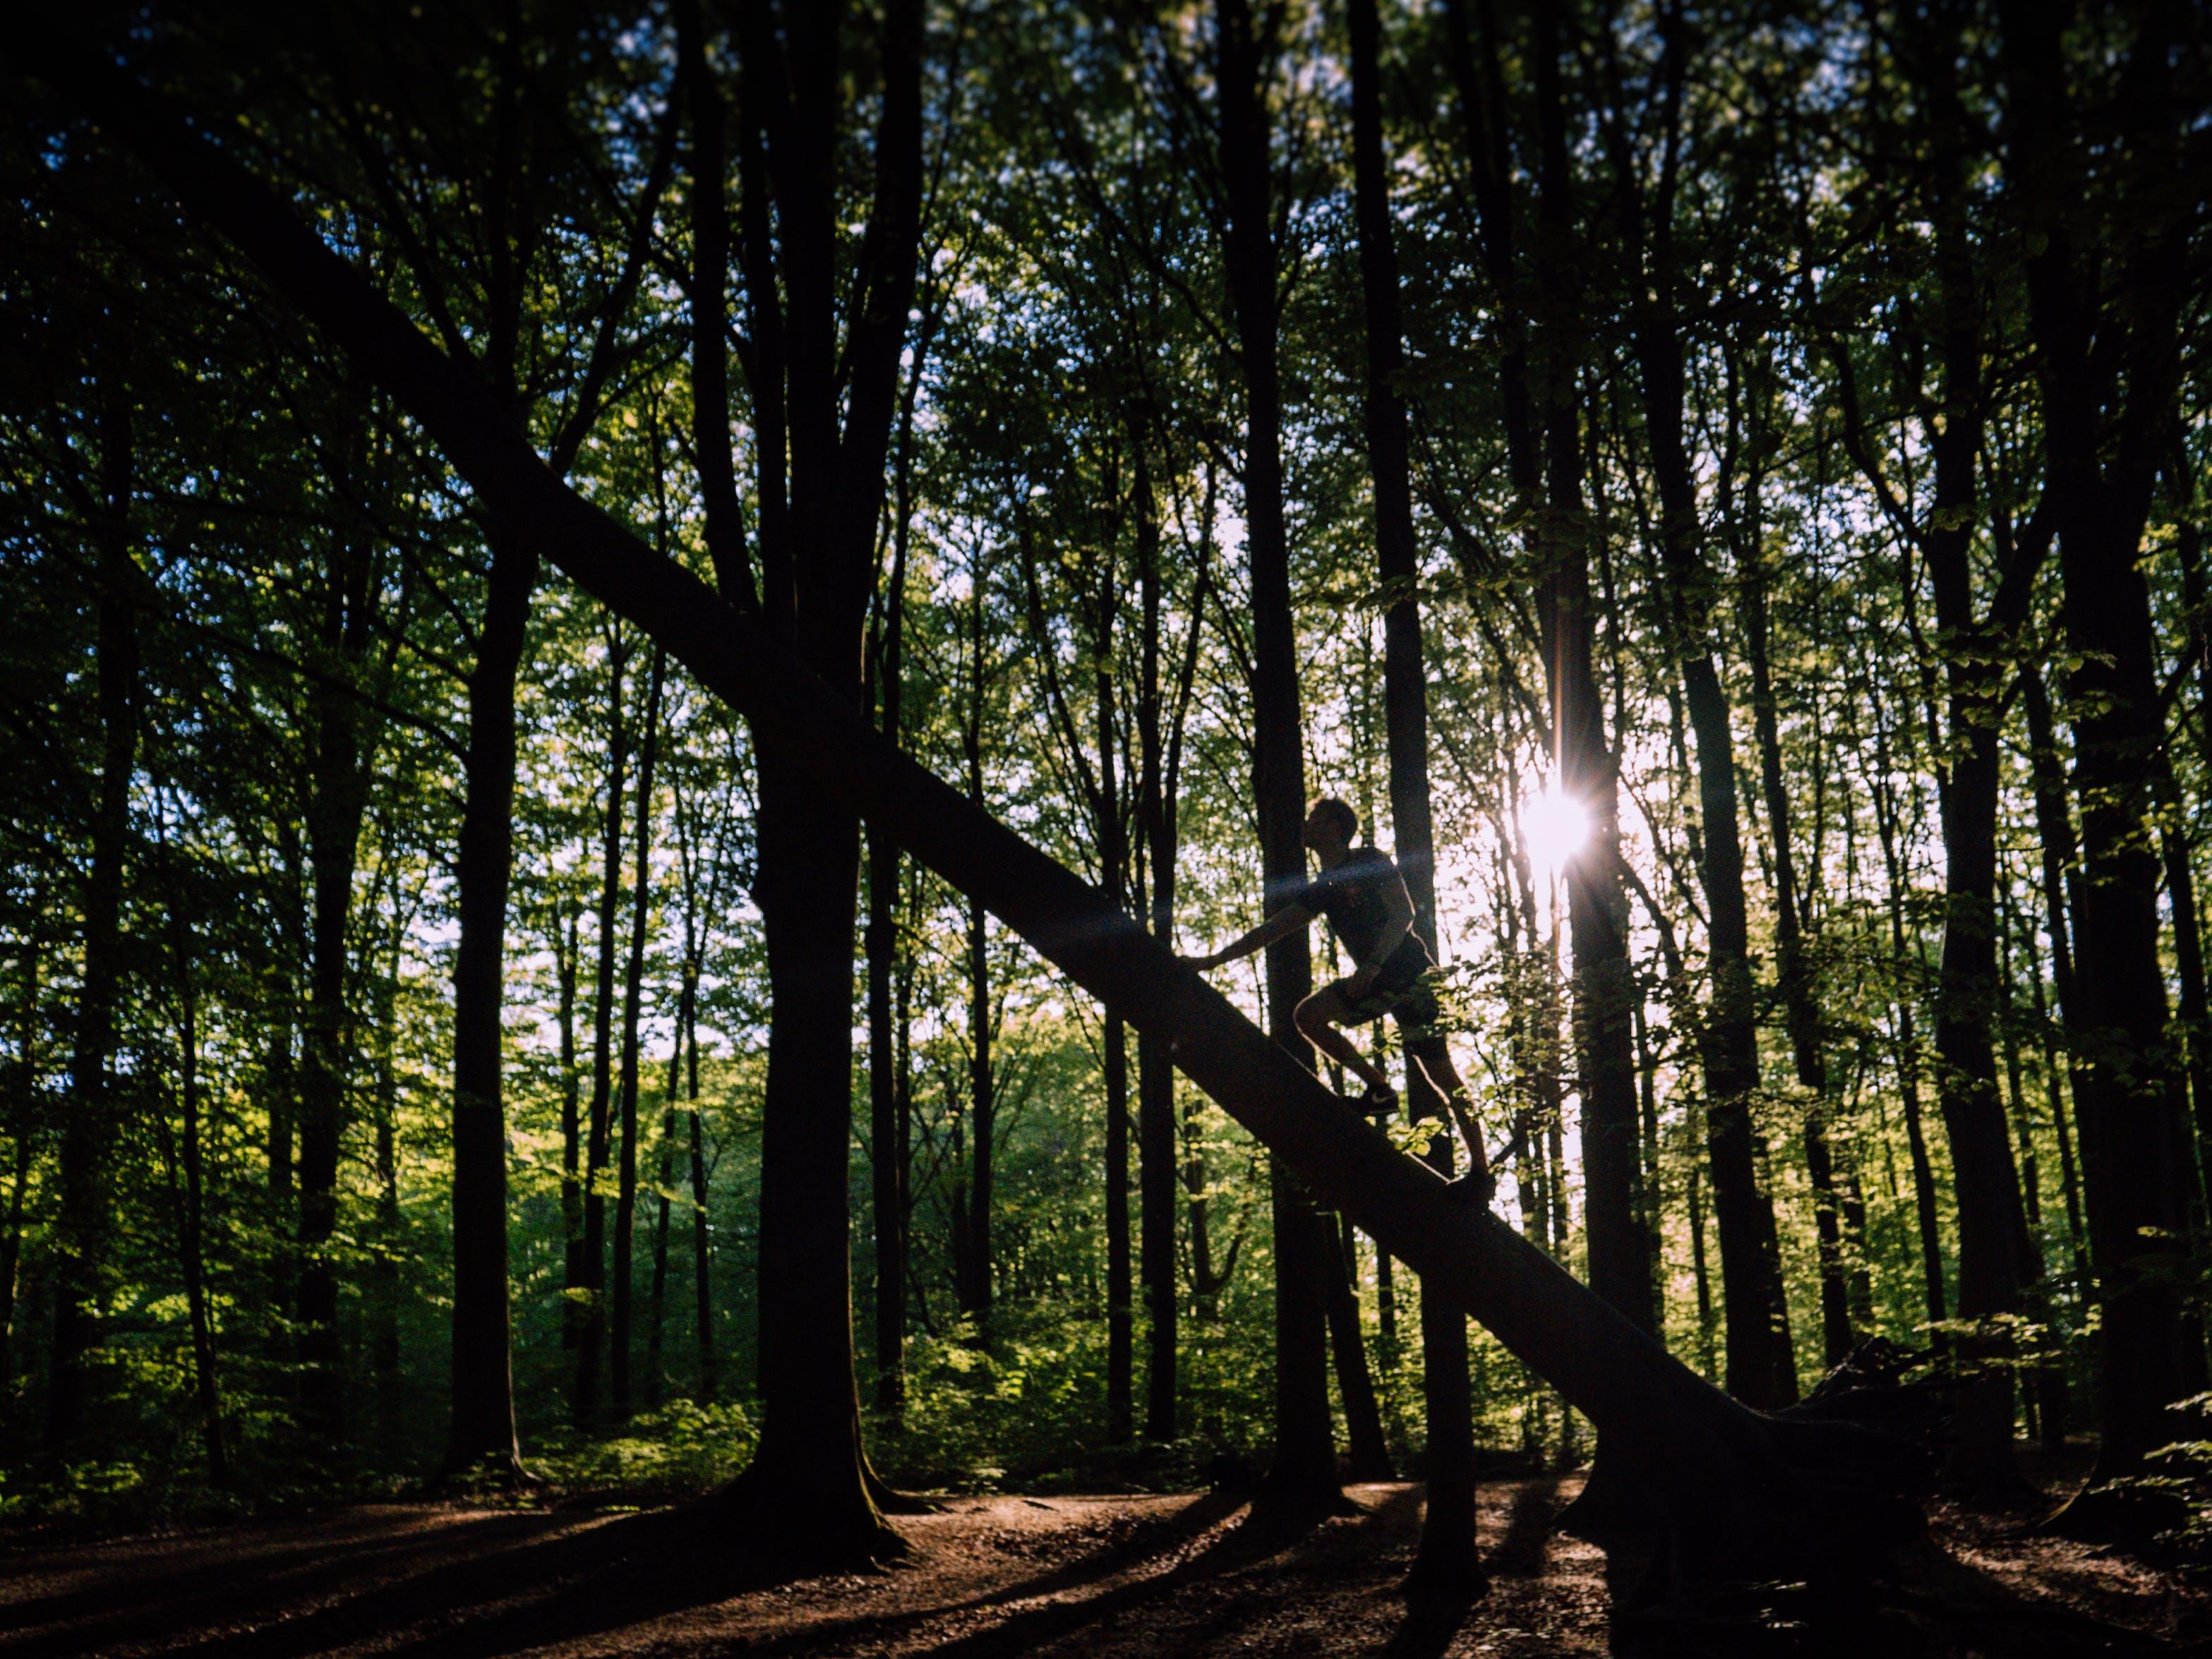 Man in Black Shirt Climbing on Tree